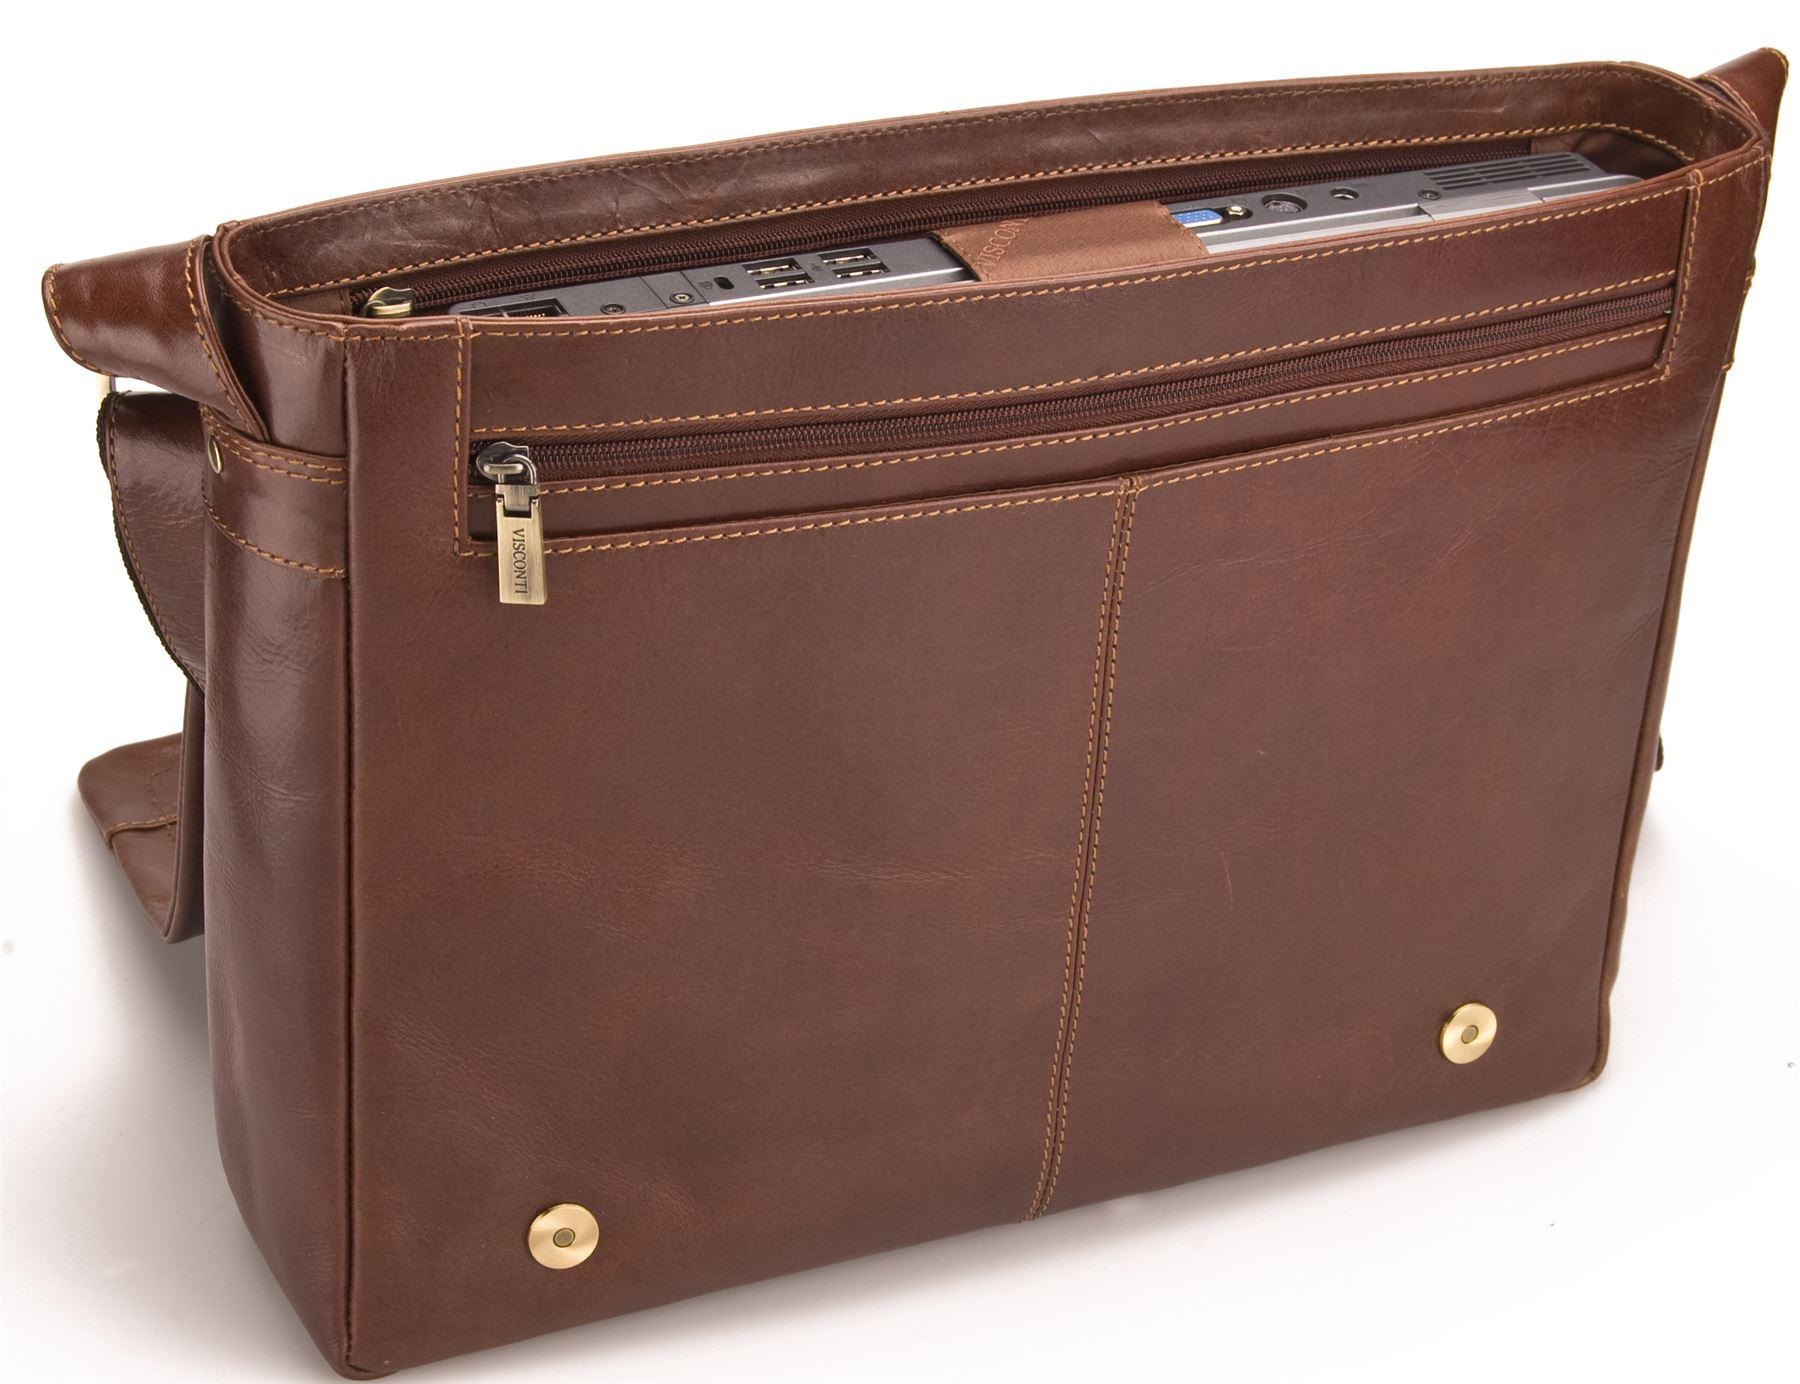 sac ordinateur portable homme femme visconti cuir vintage nouveau vt 5 ebay. Black Bedroom Furniture Sets. Home Design Ideas